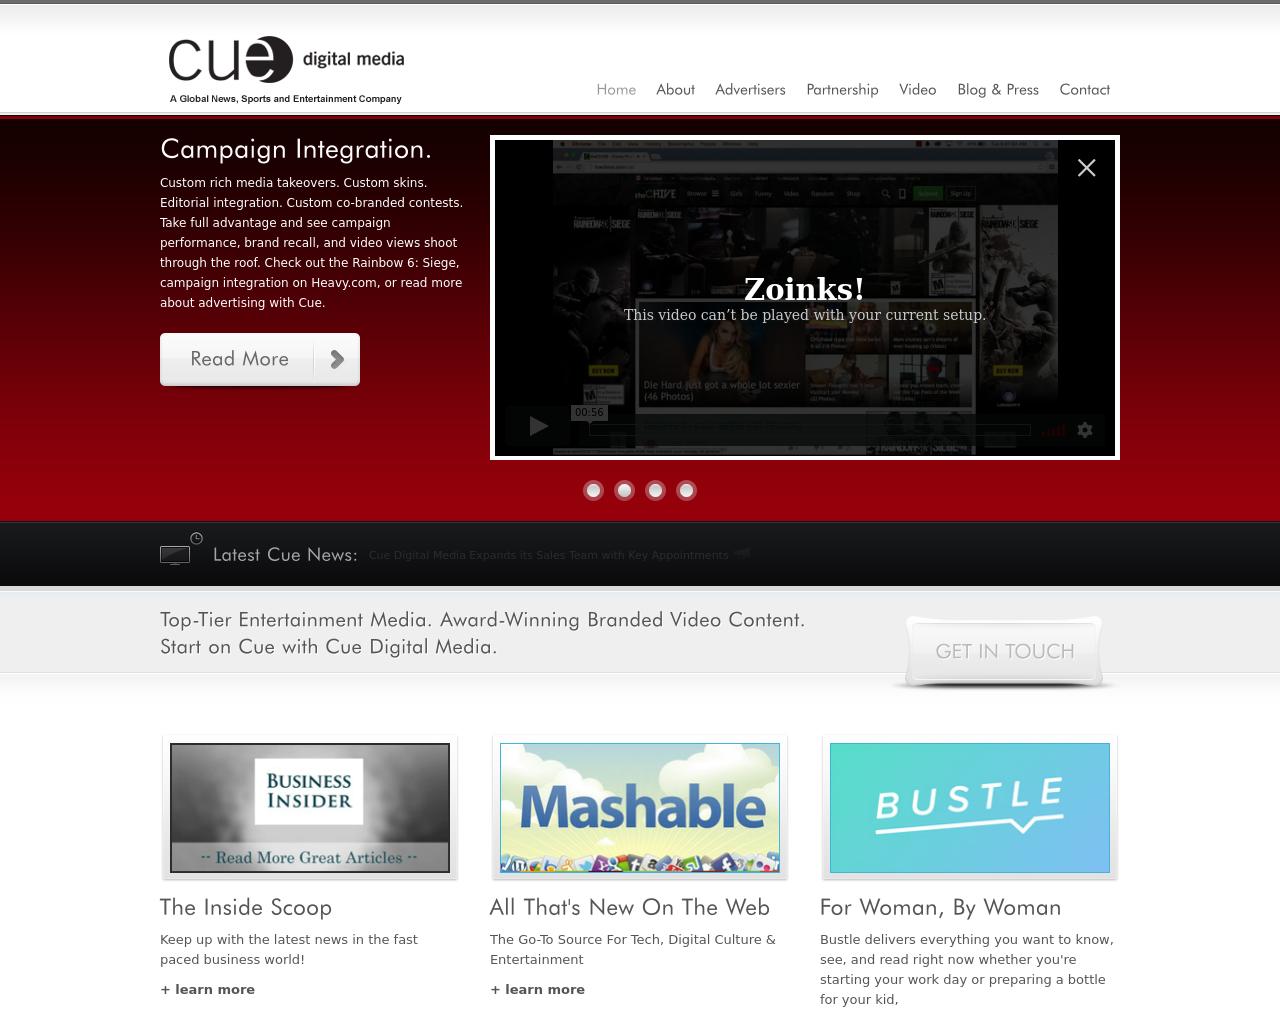 Cue-Digital-Media-Advertising-Reviews-Pricing